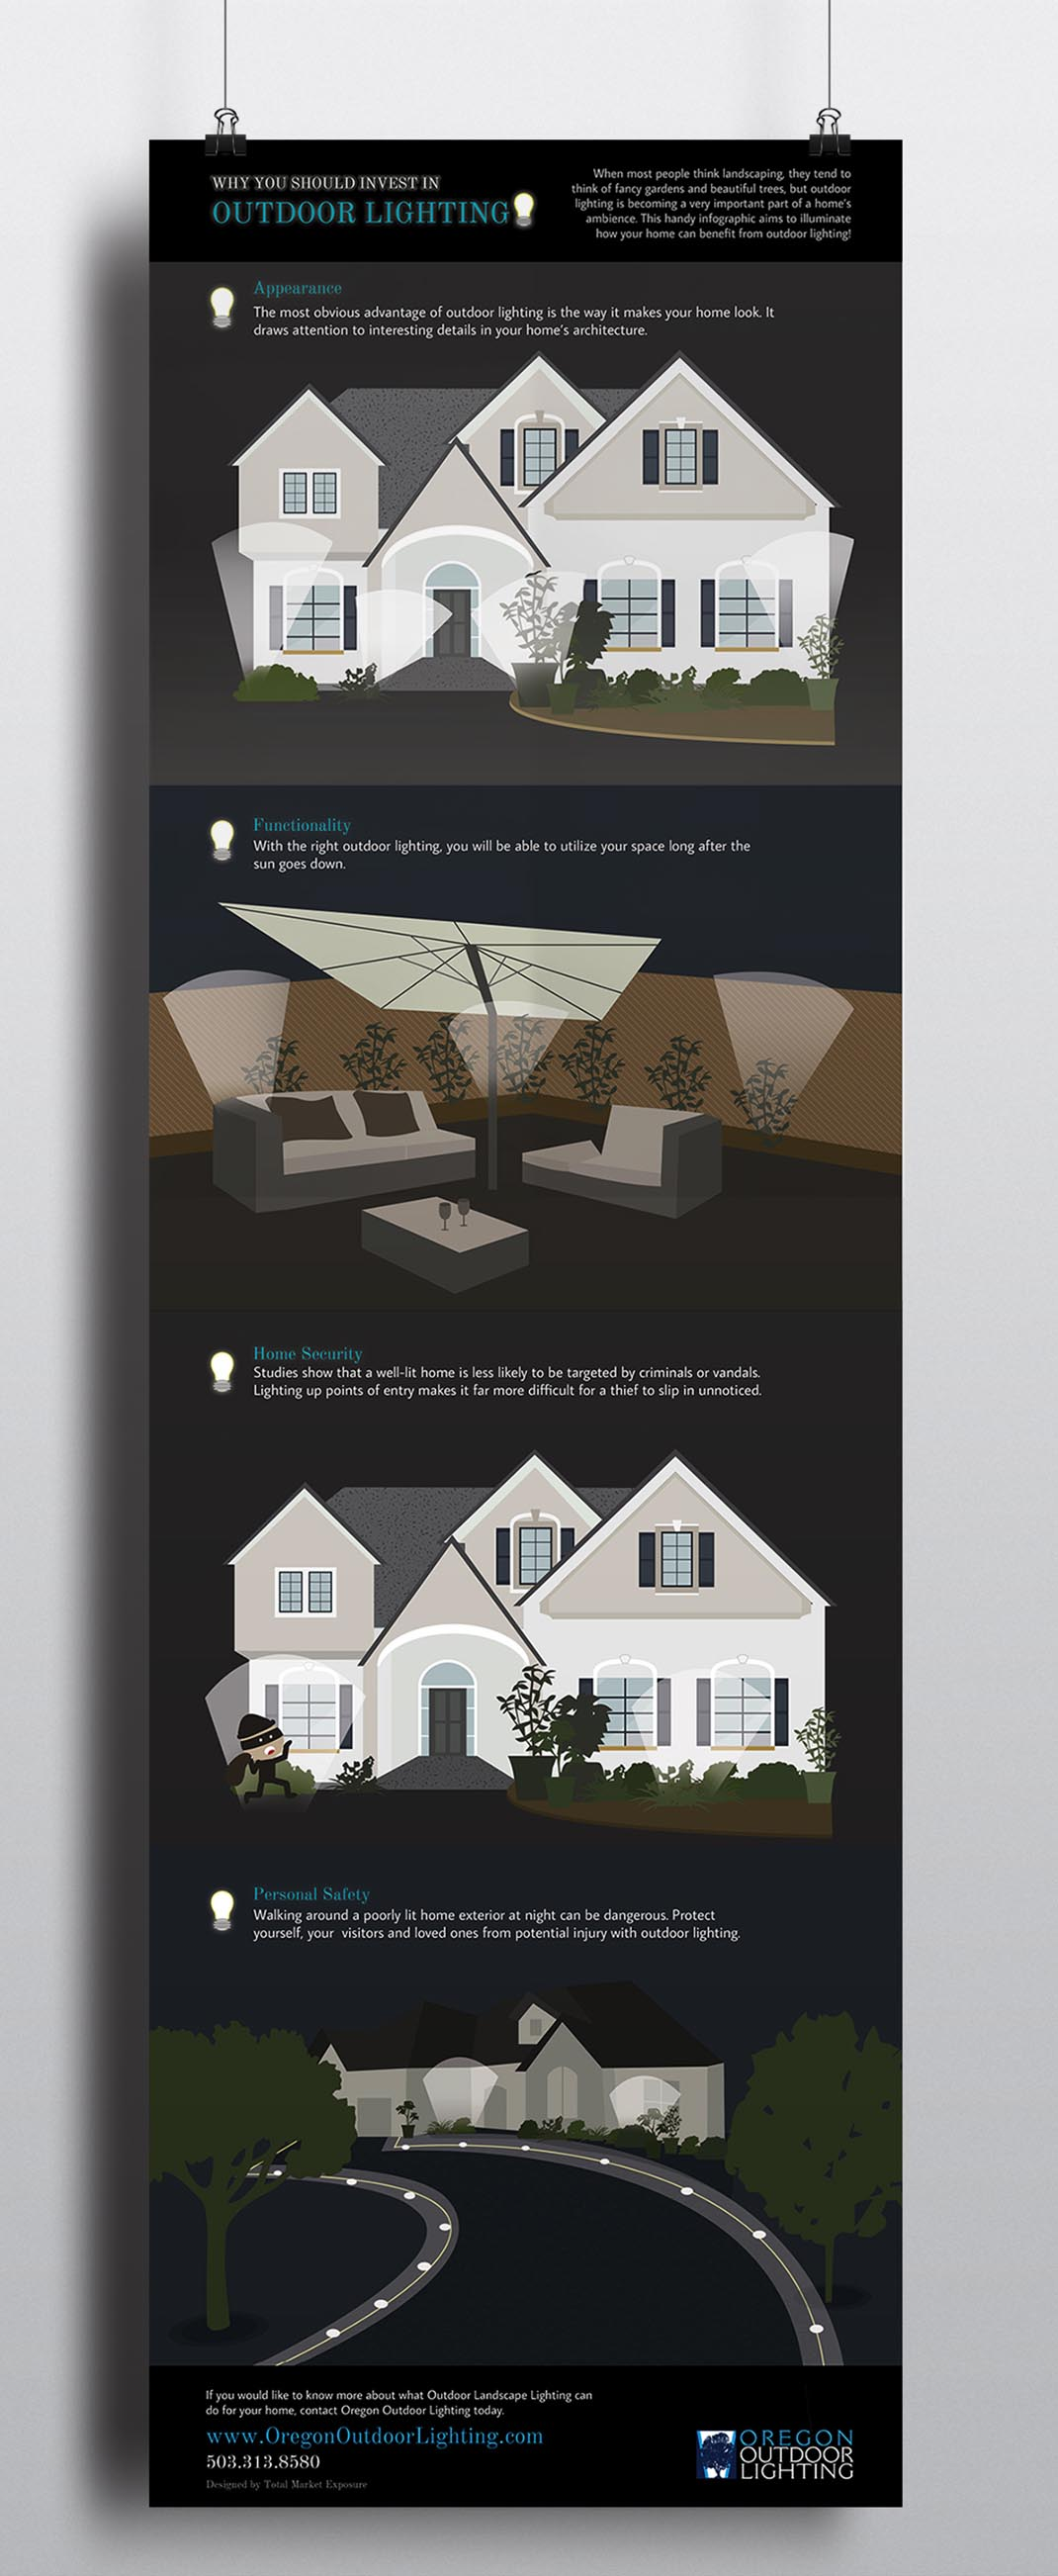 oregon-outdoor-lighting-infographic